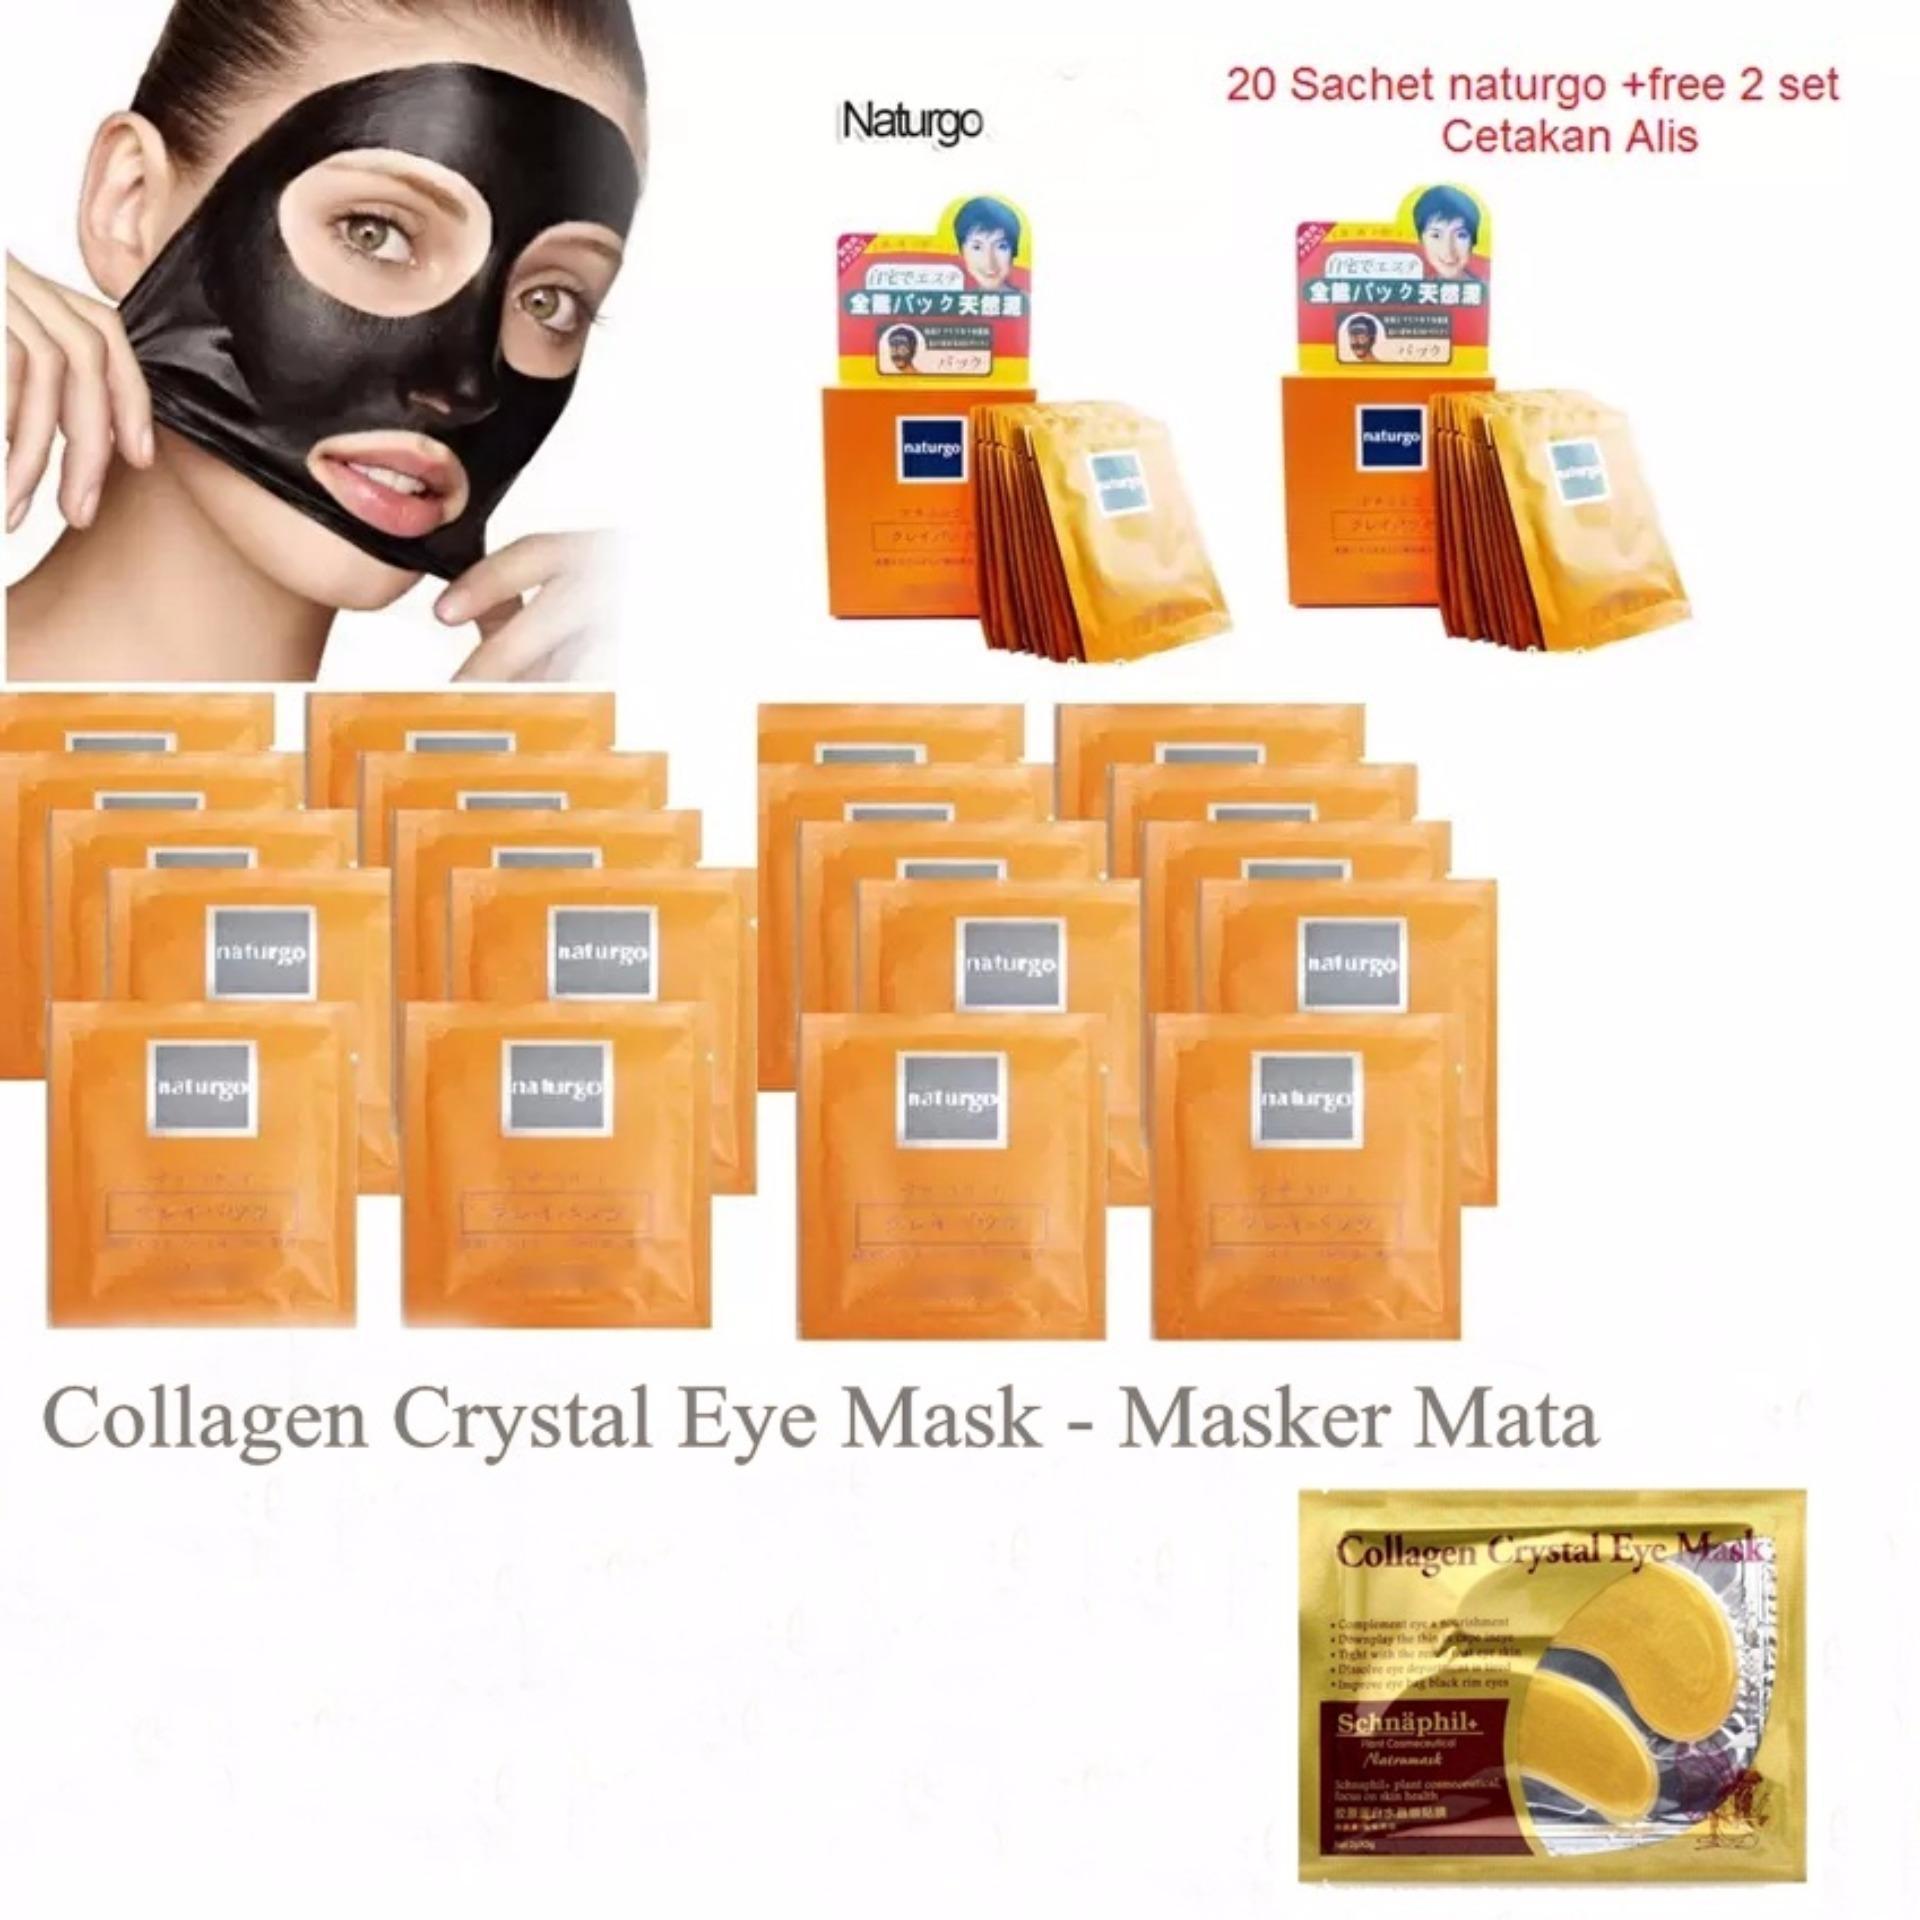 Jbs Alat Pemancung Hidung Perawatan Mata Collagen Crystal Eye Mask Masker Colagen Cystal Source Mascara Waterproof 20 Pcs Naturgo Lumpur